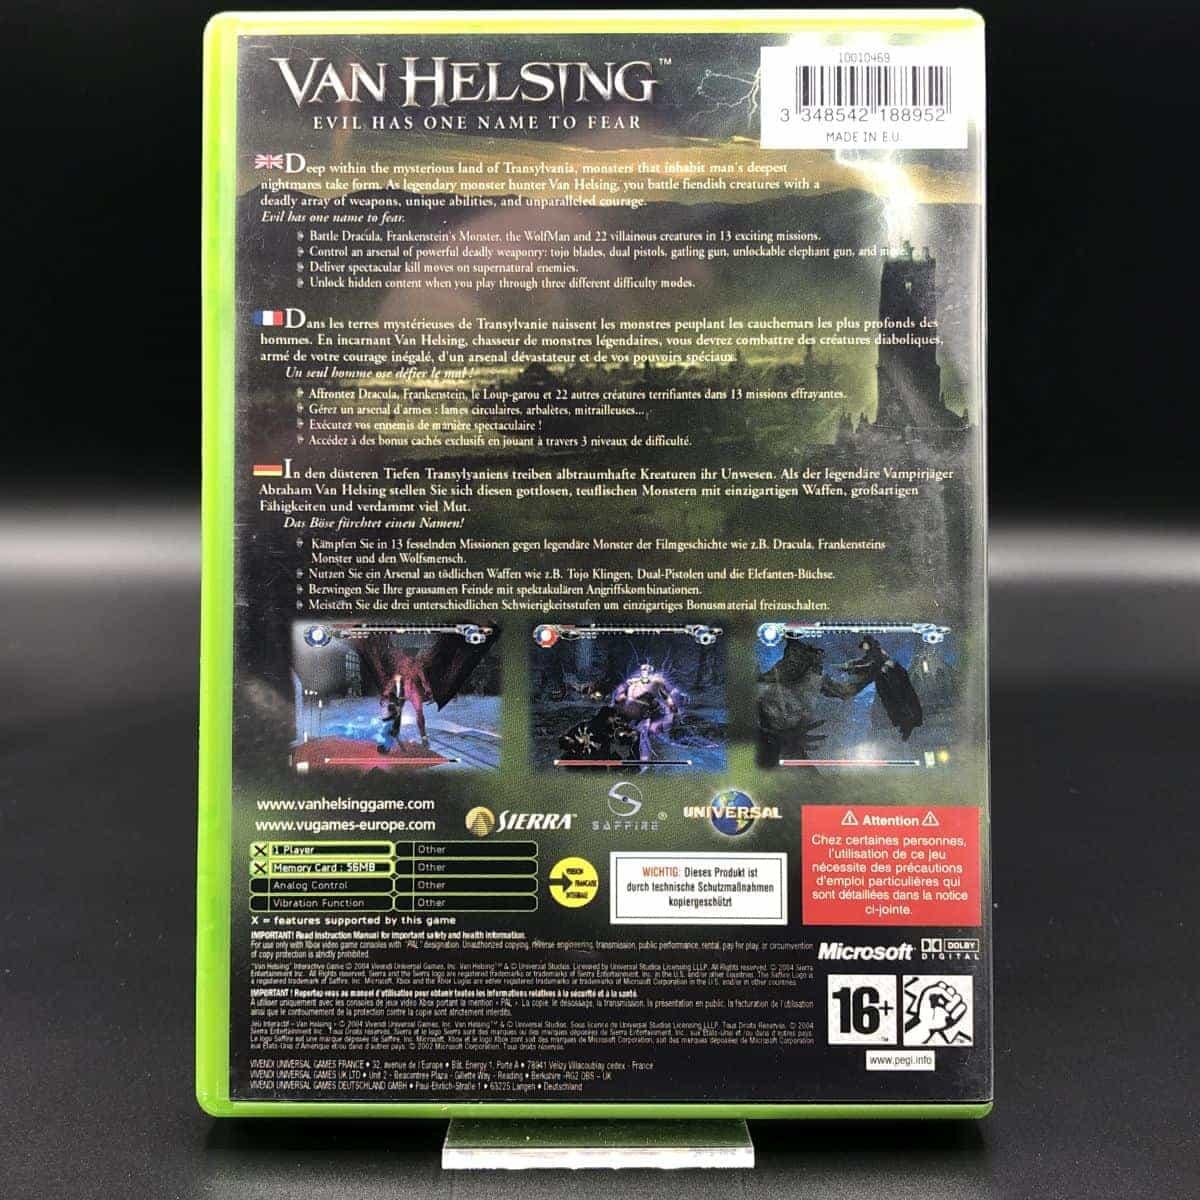 XBC Van Helsing (Komplett) (Gebrauchsspuren) Microsoft Xbox Classic